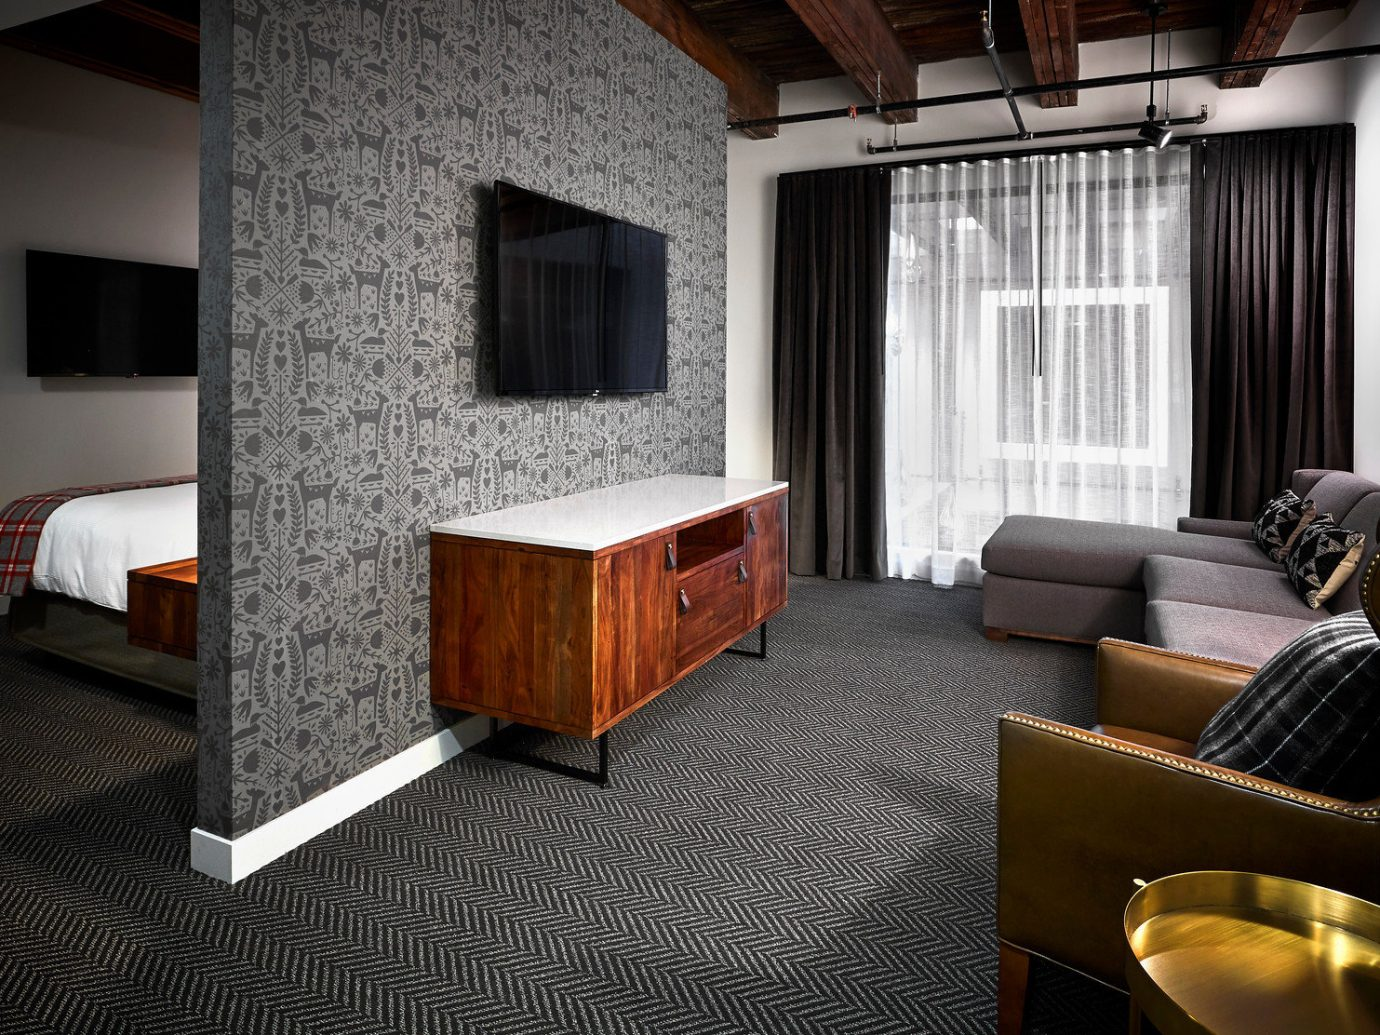 America Trip Ideas Weekend Getaways indoor floor room Living property window house Suite ceiling living room home interior design cottage estate real estate Design furniture